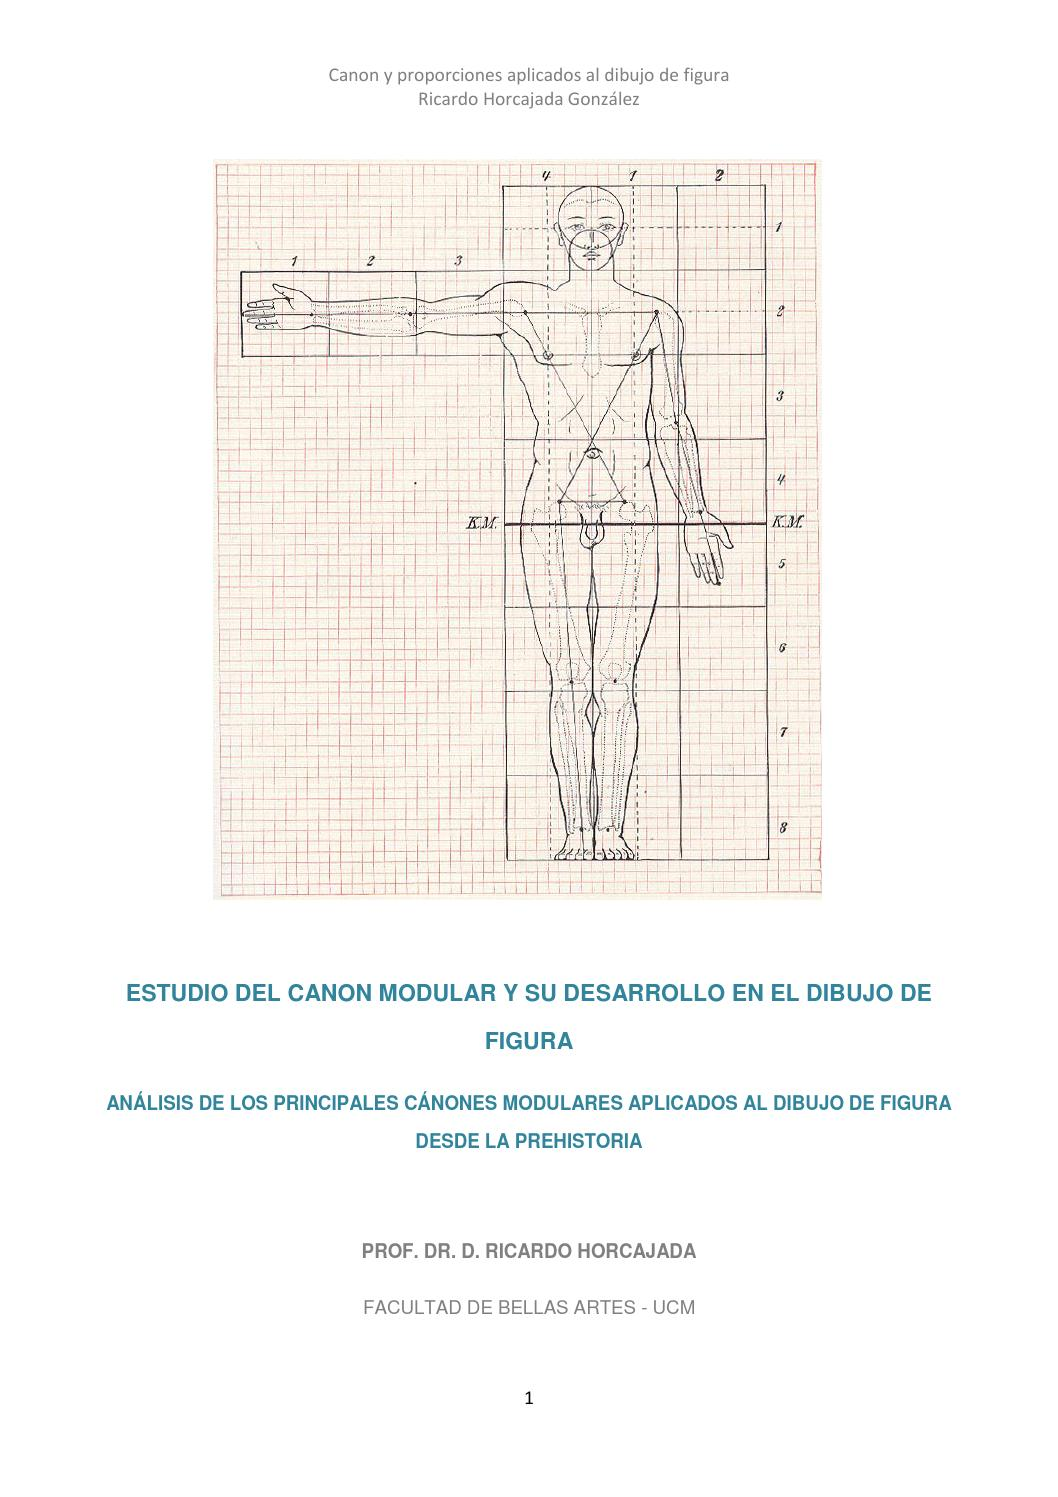 Canon modular y dibujo de figura by ricardo horcajada - issuu